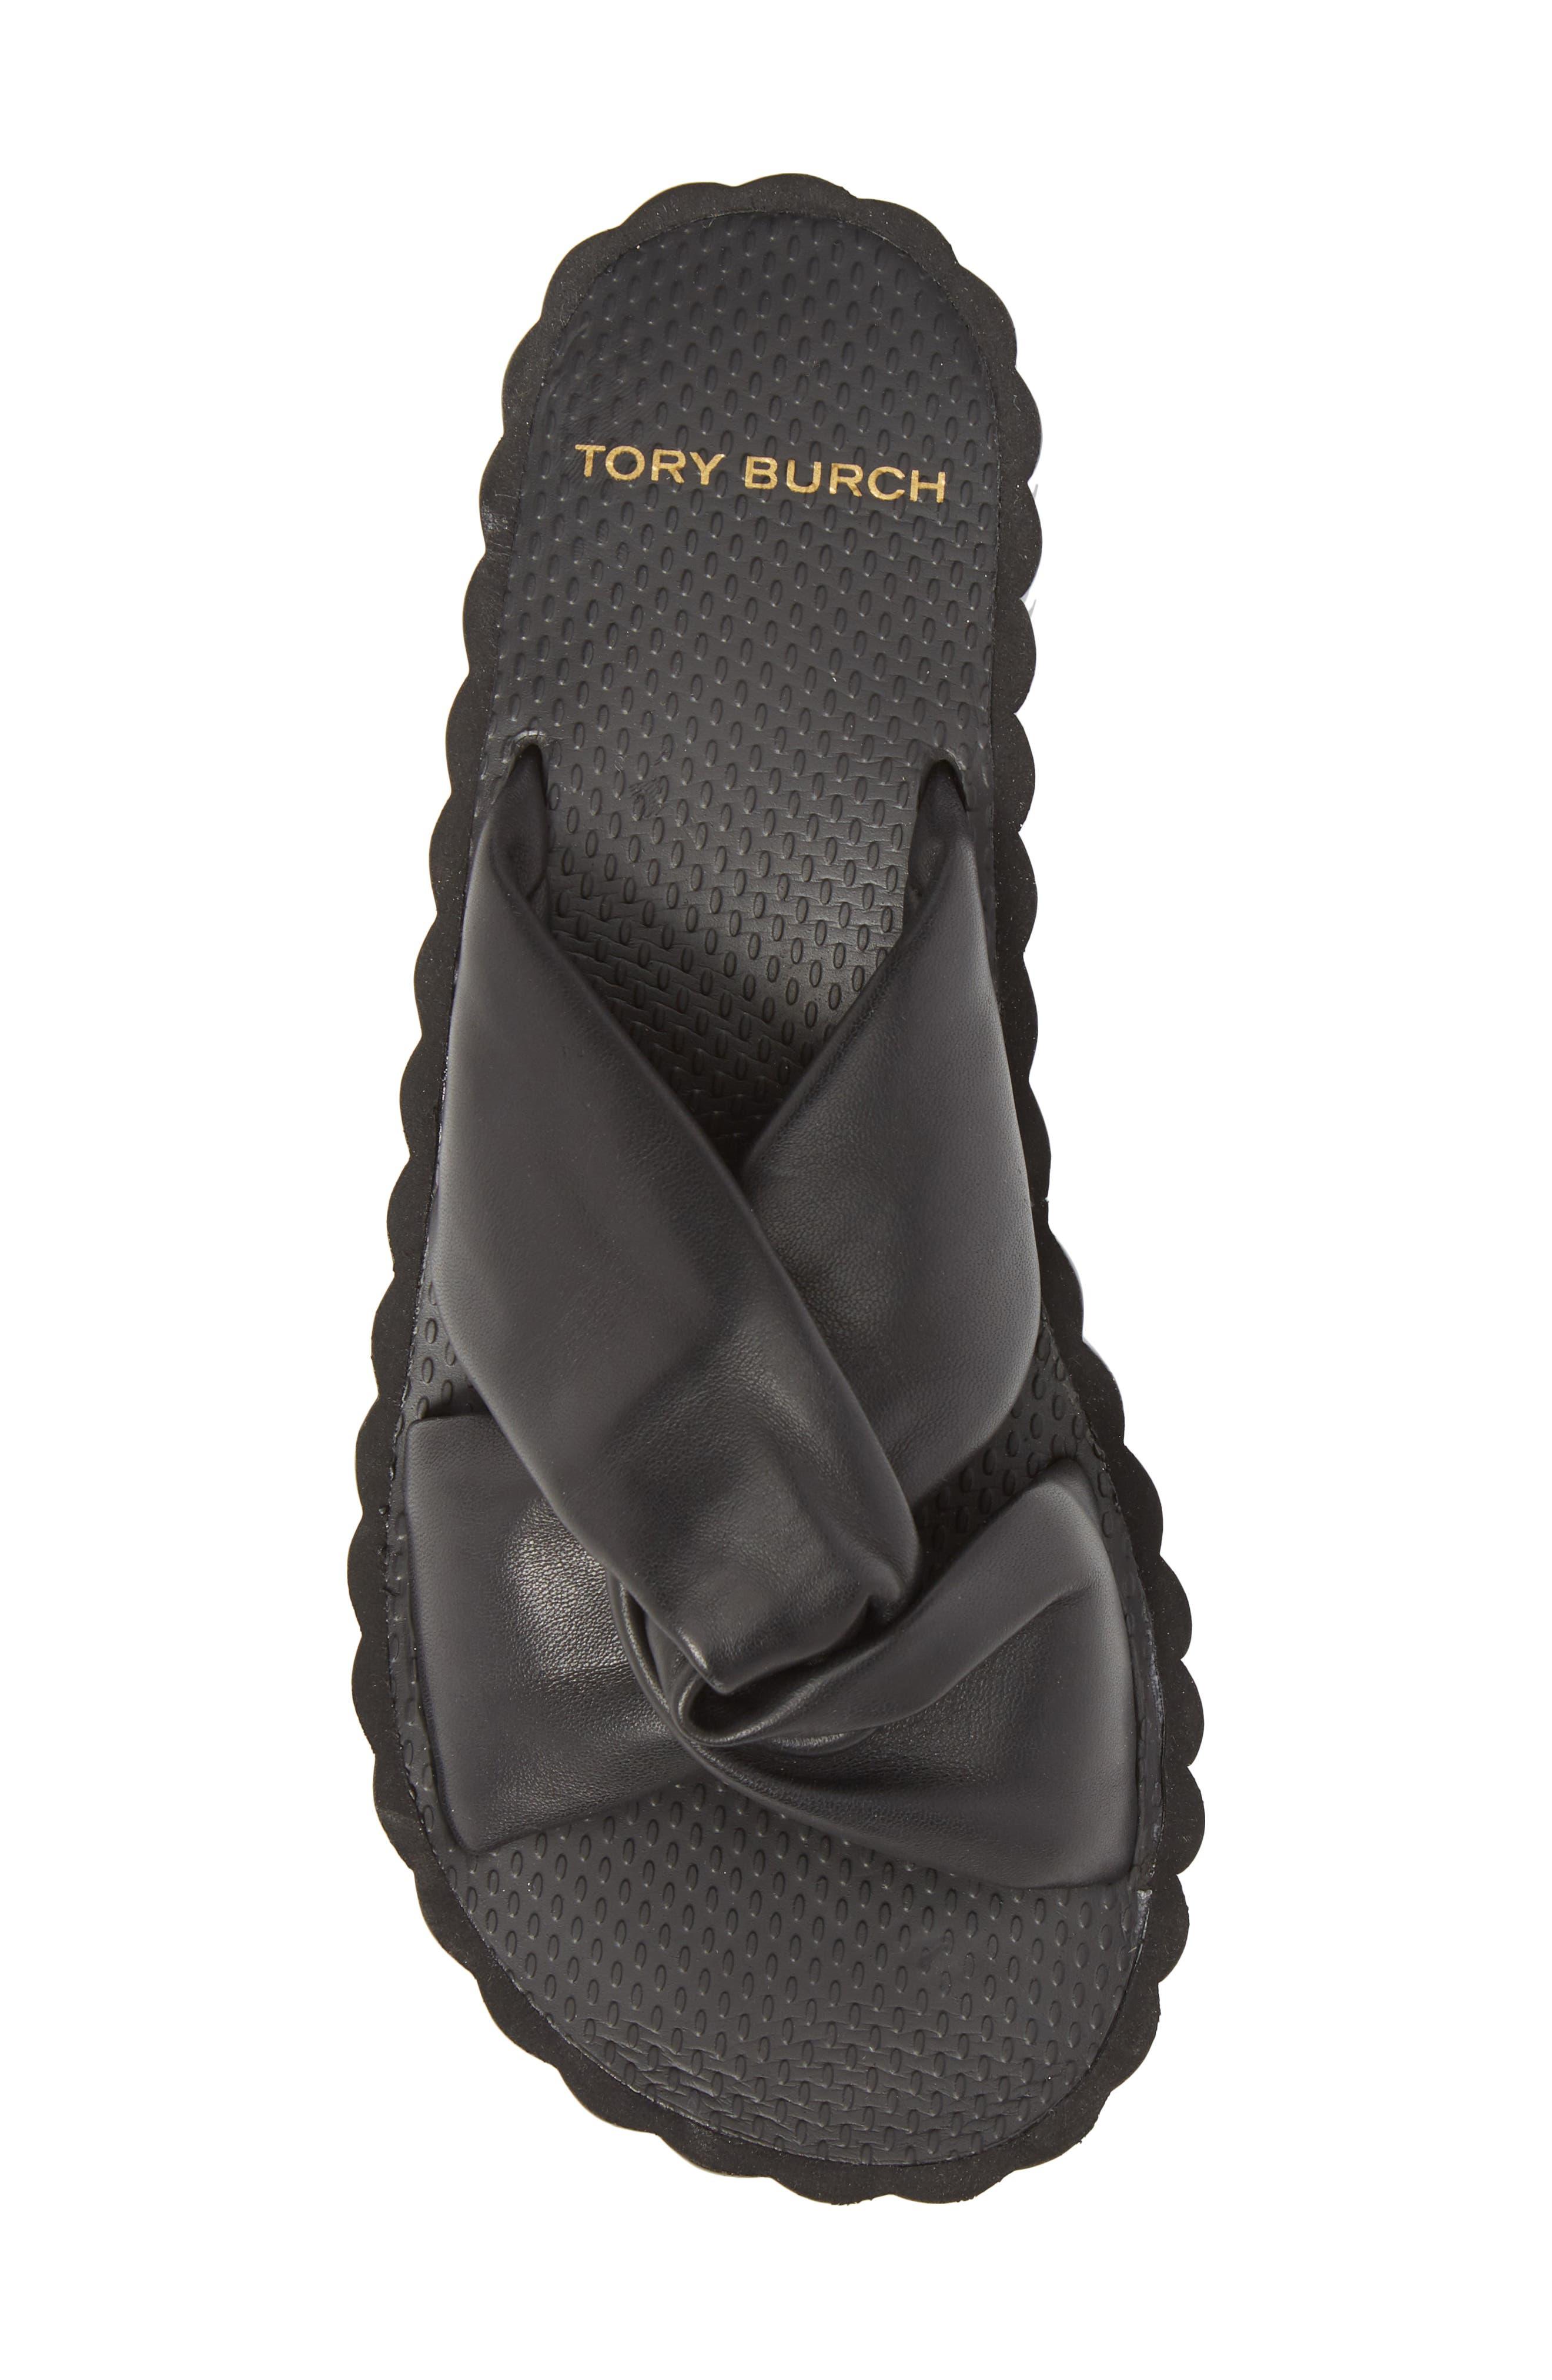 TORY BURCH,                             Scallop Platform Slide Sandal,                             Alternate thumbnail 5, color,                             006